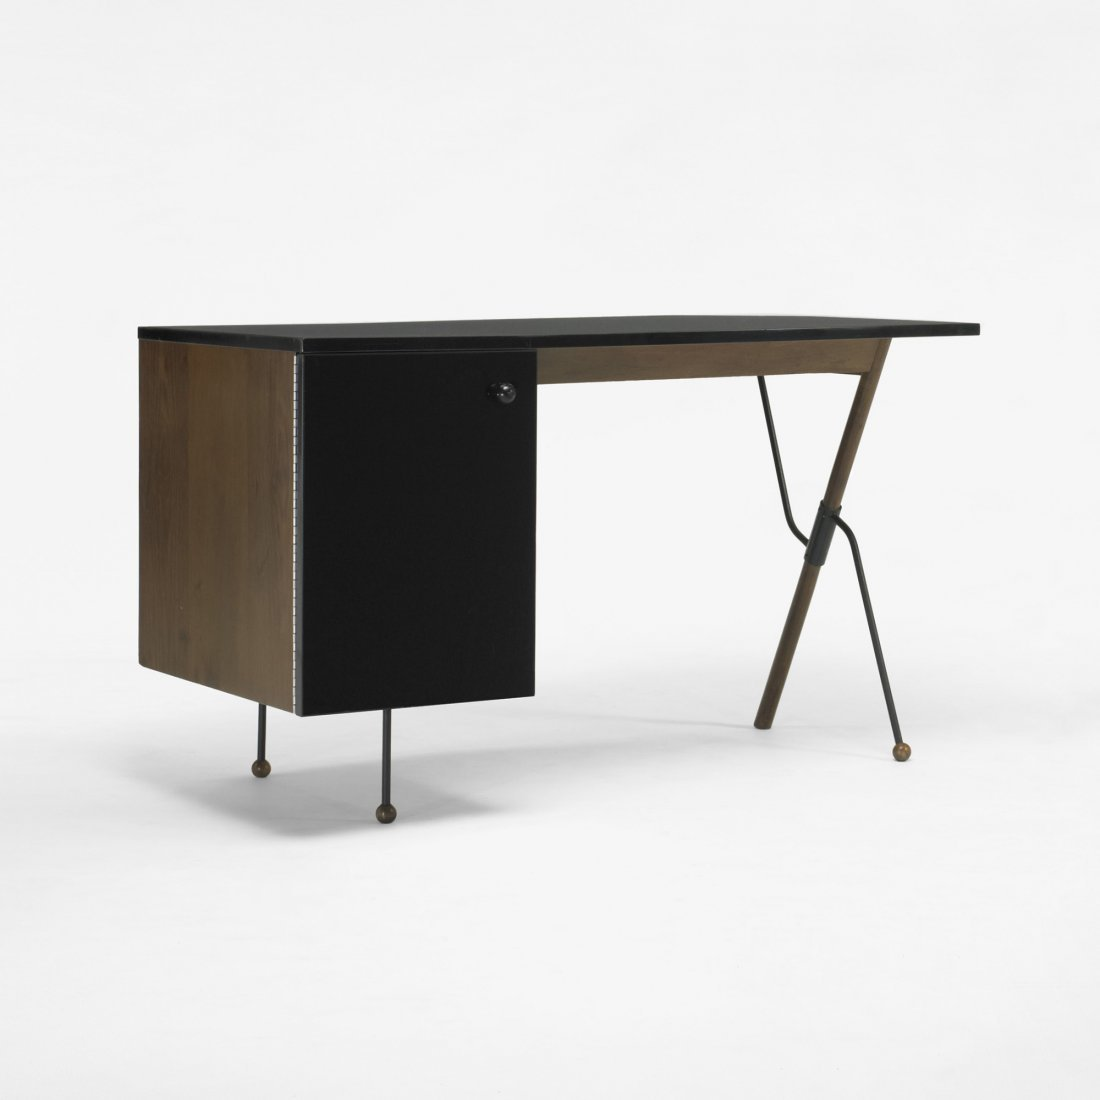 104: Greta  Magnusson Grossman desk